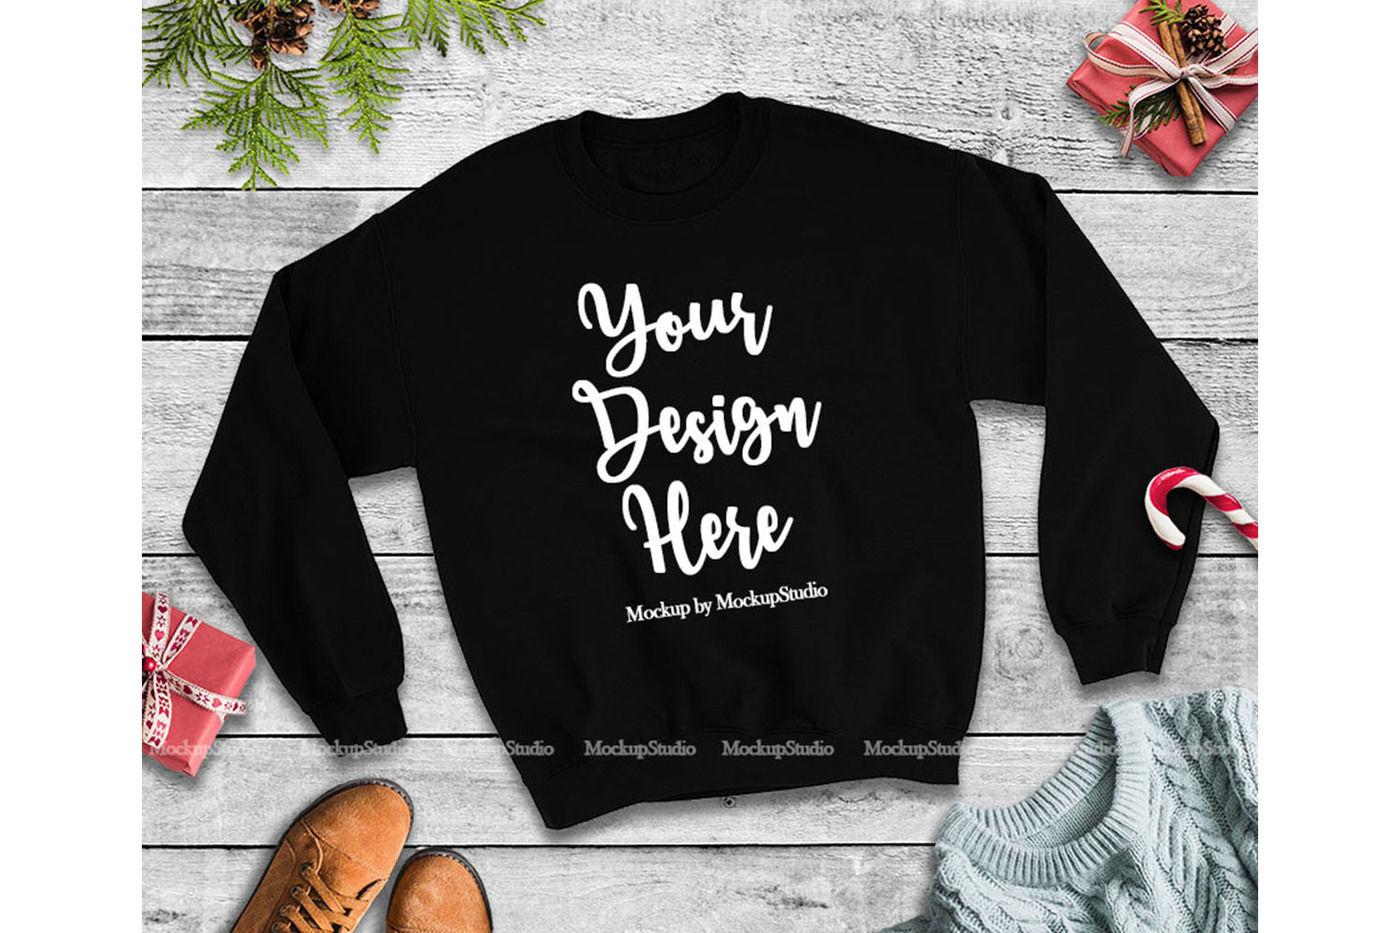 Christmas Winter Party Black Unisex Sweatshirt Mock Up By